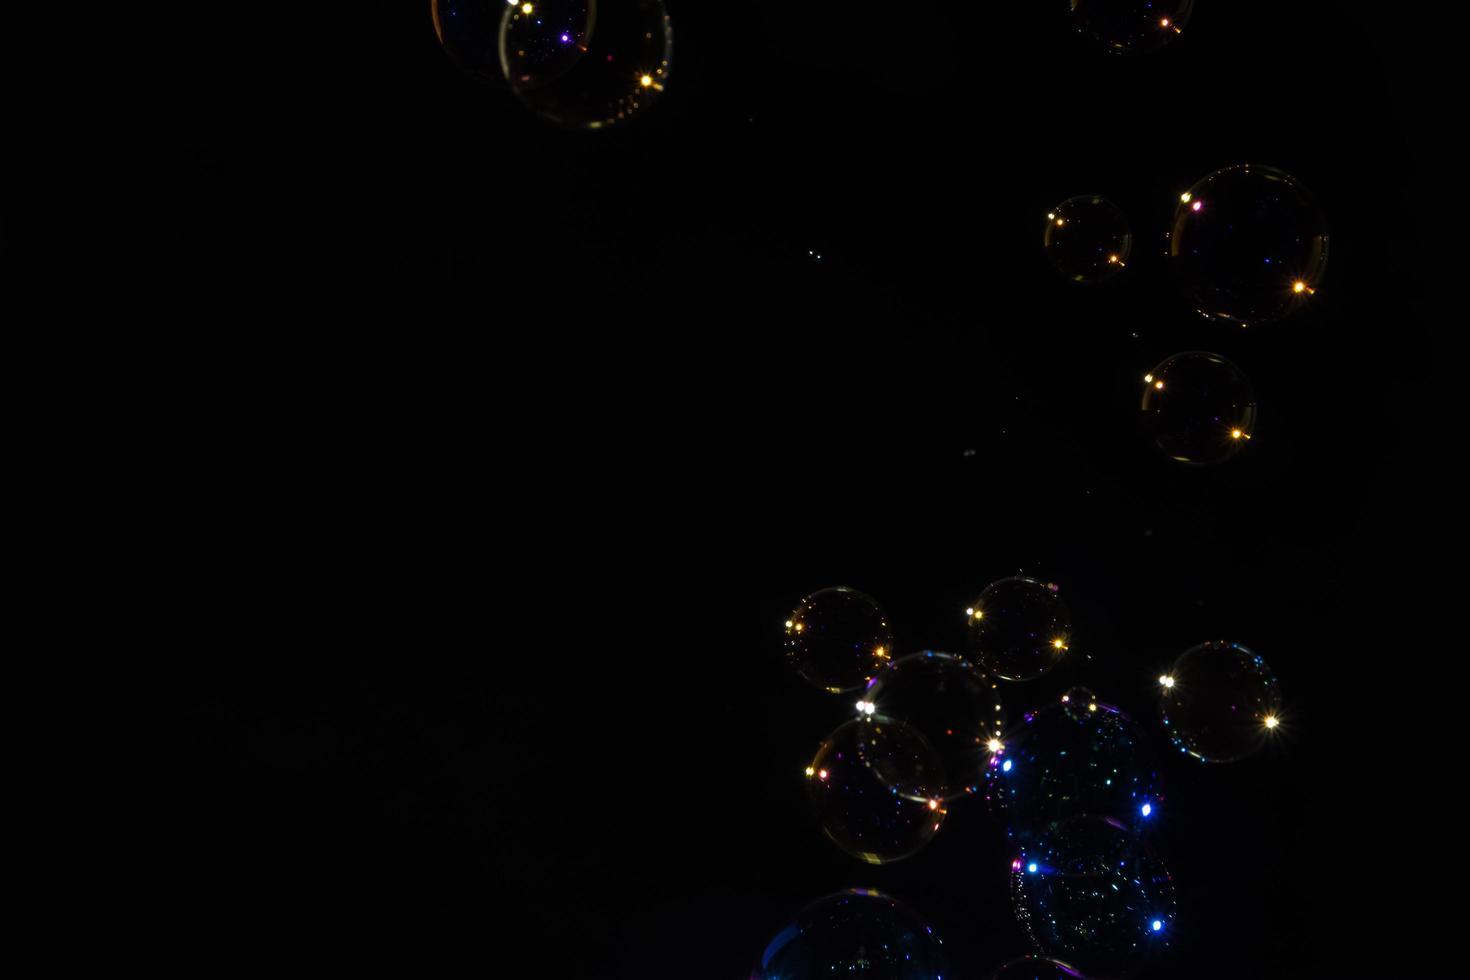 bubblor på svart bakgrund foto